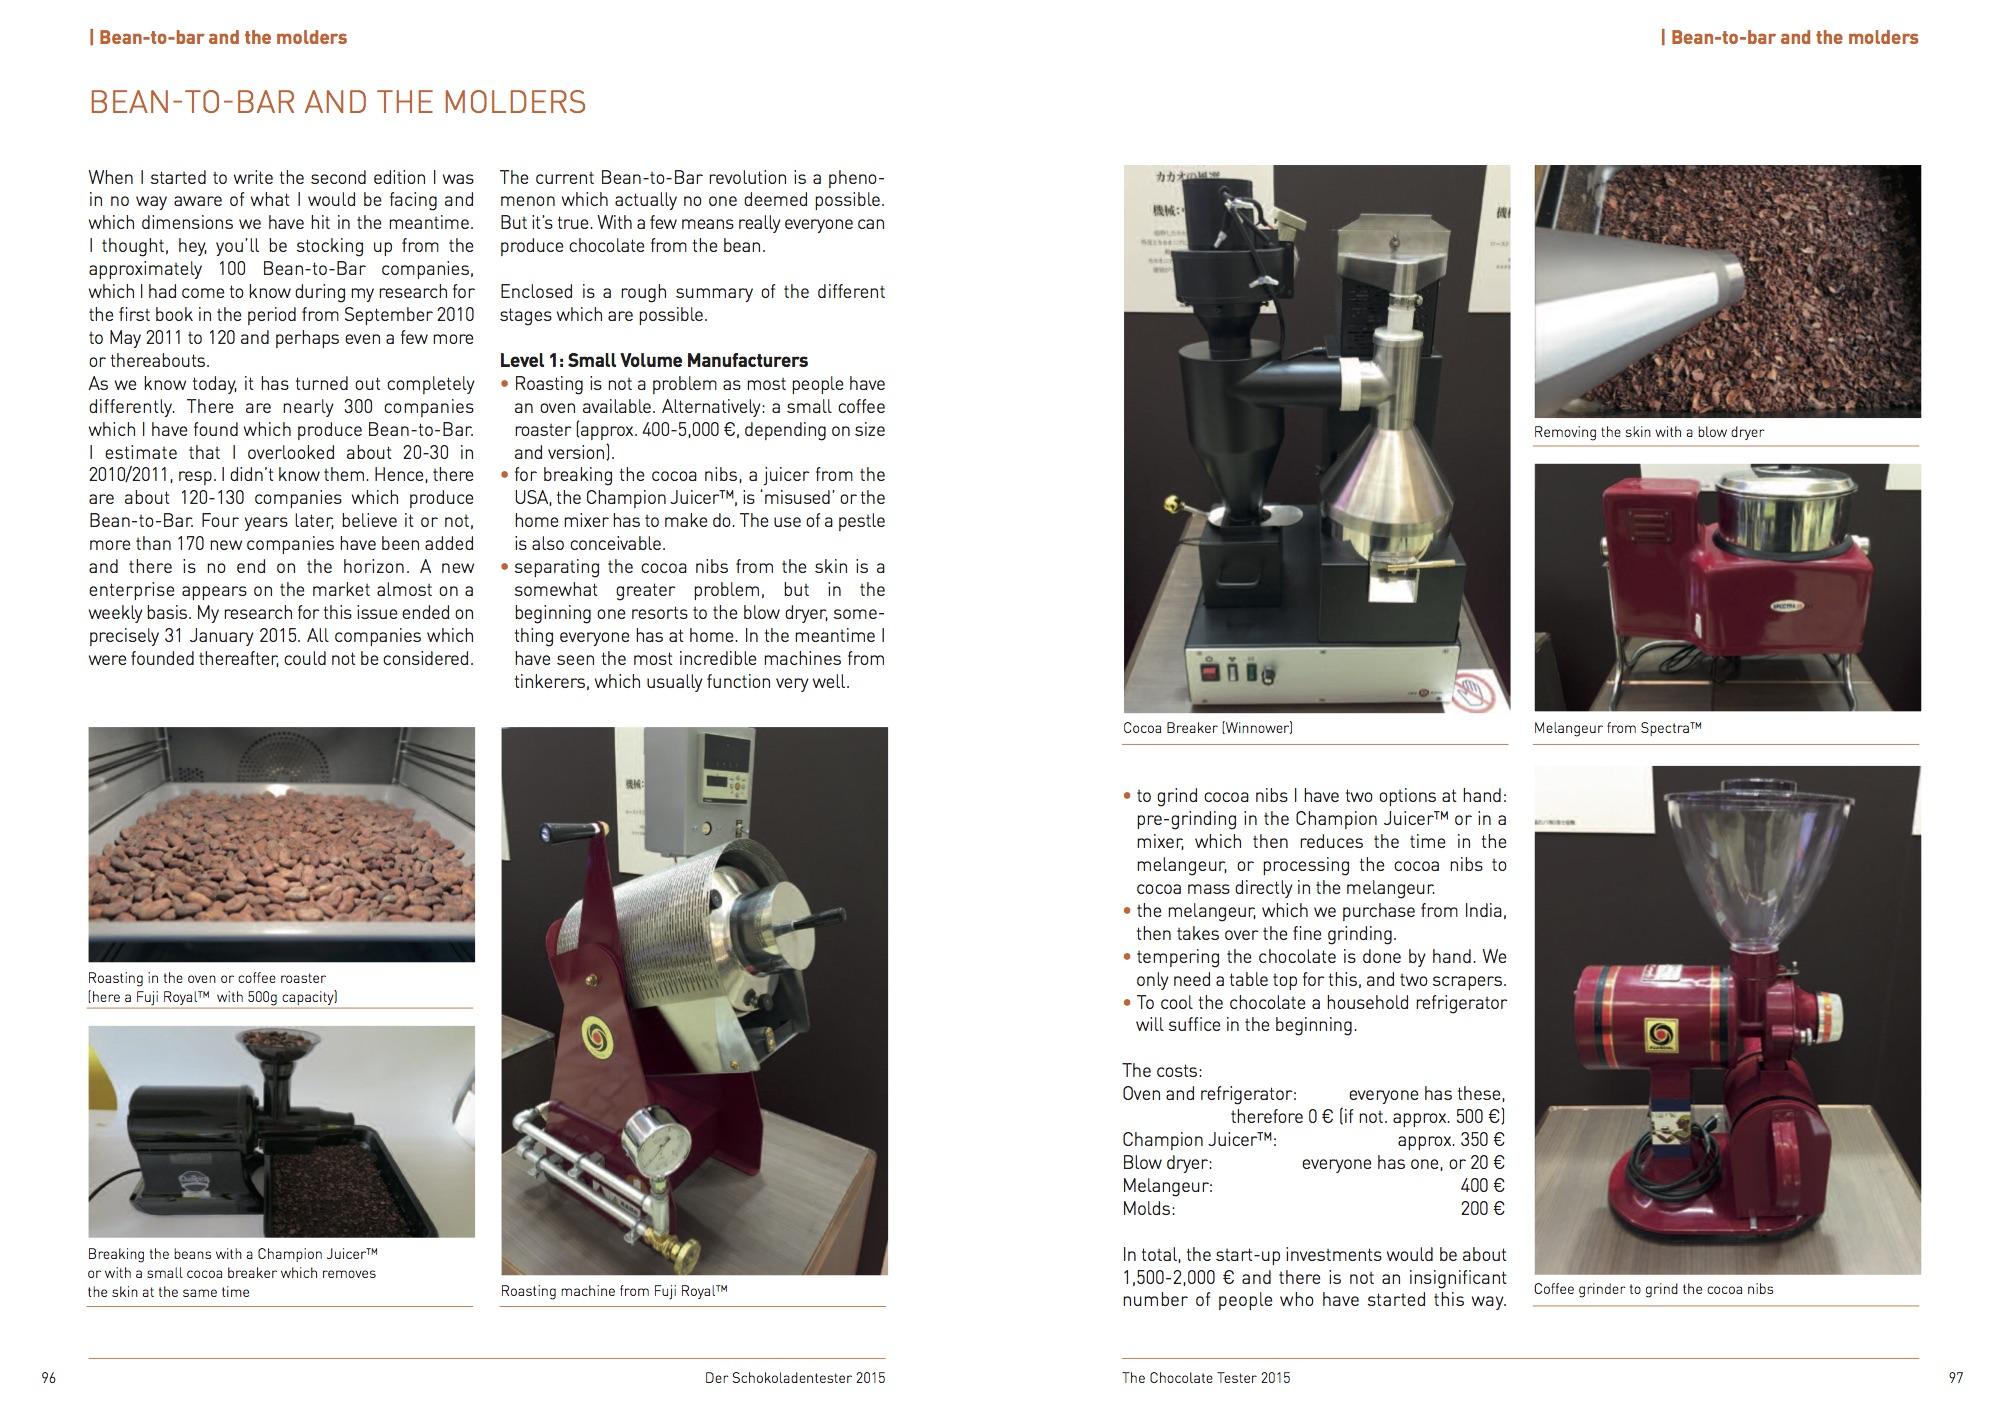 bean-to-bar-molders_st2015.jpg